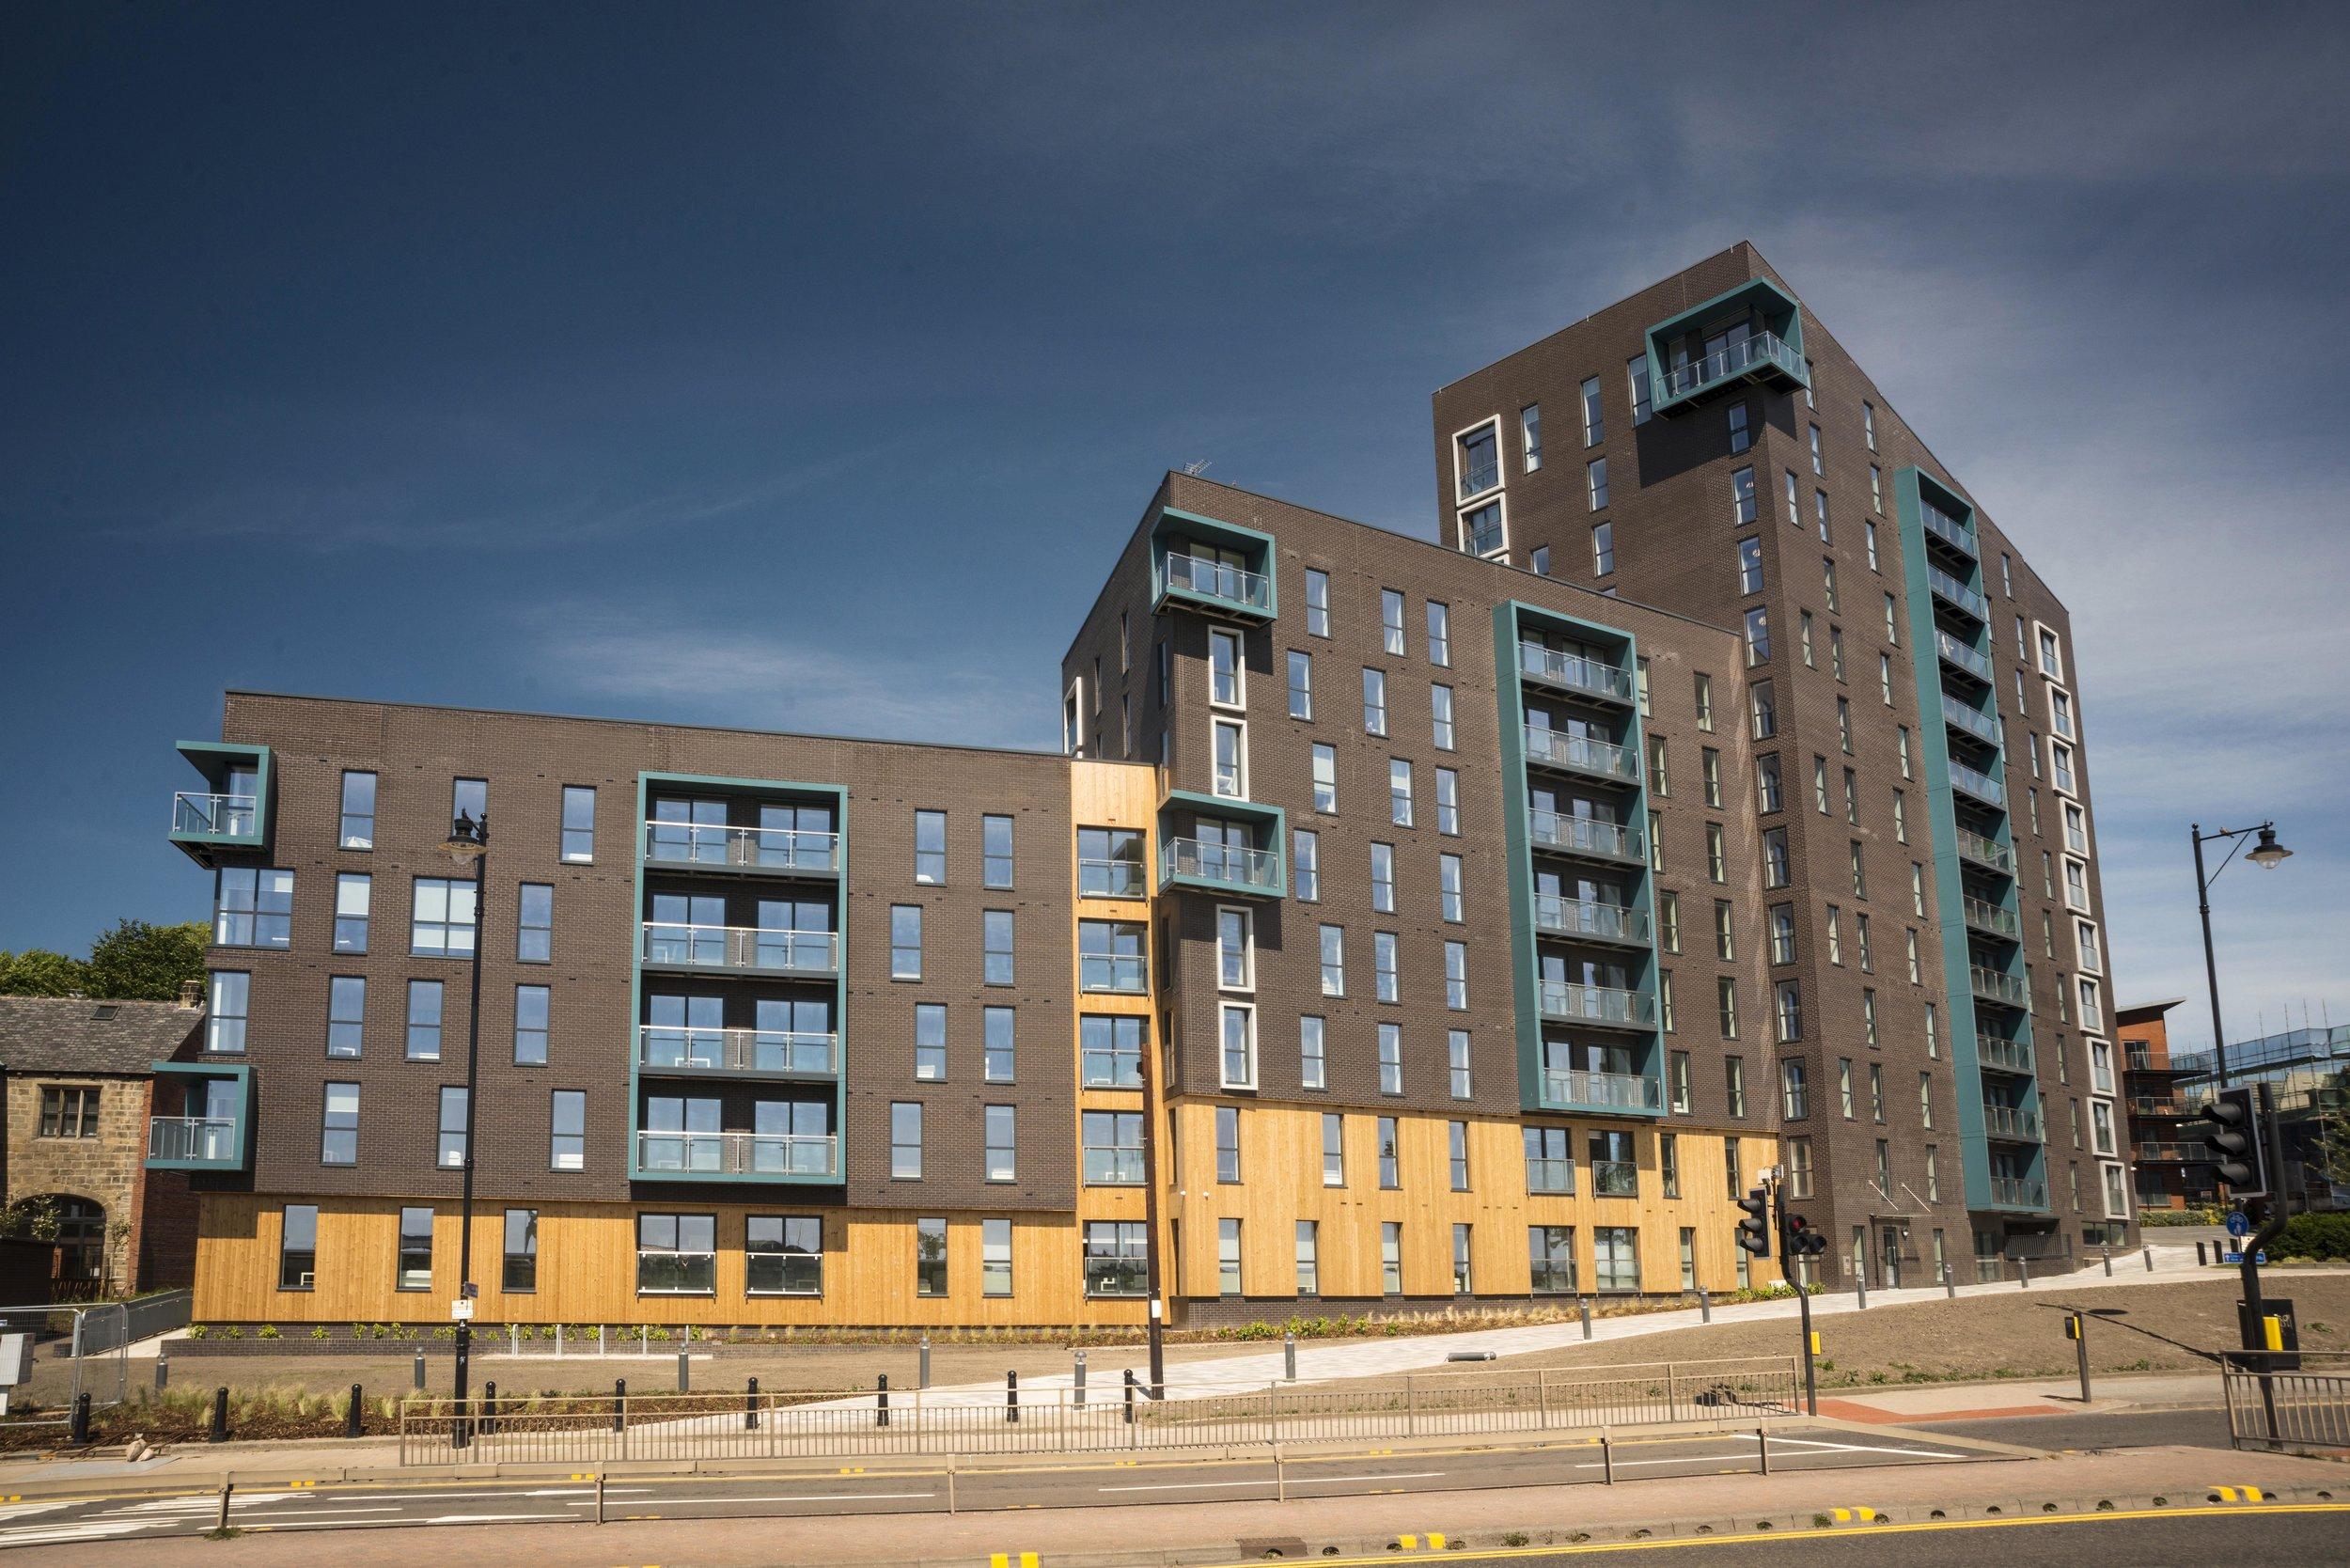 Apartments: X1 Aire, Leeds